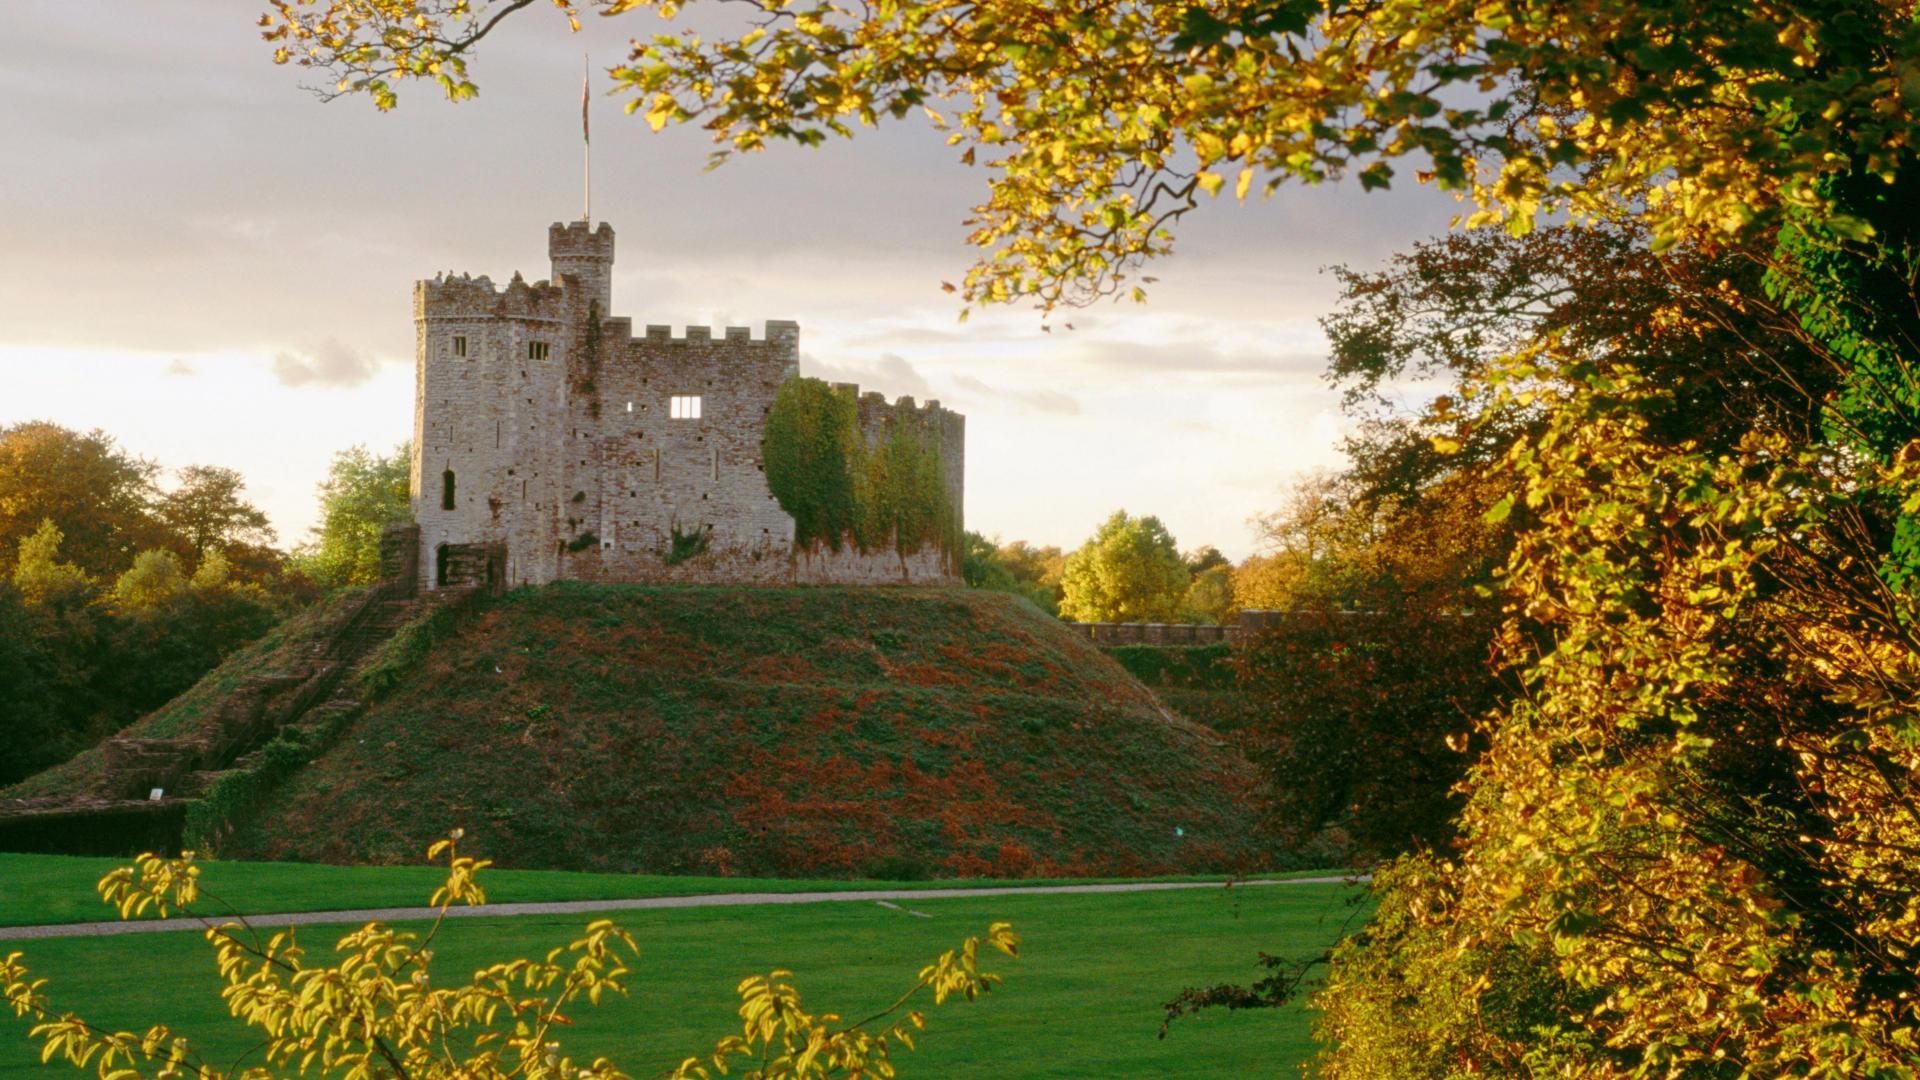 Download Original Cardiff Castle 1689084 Hd Wallpaper